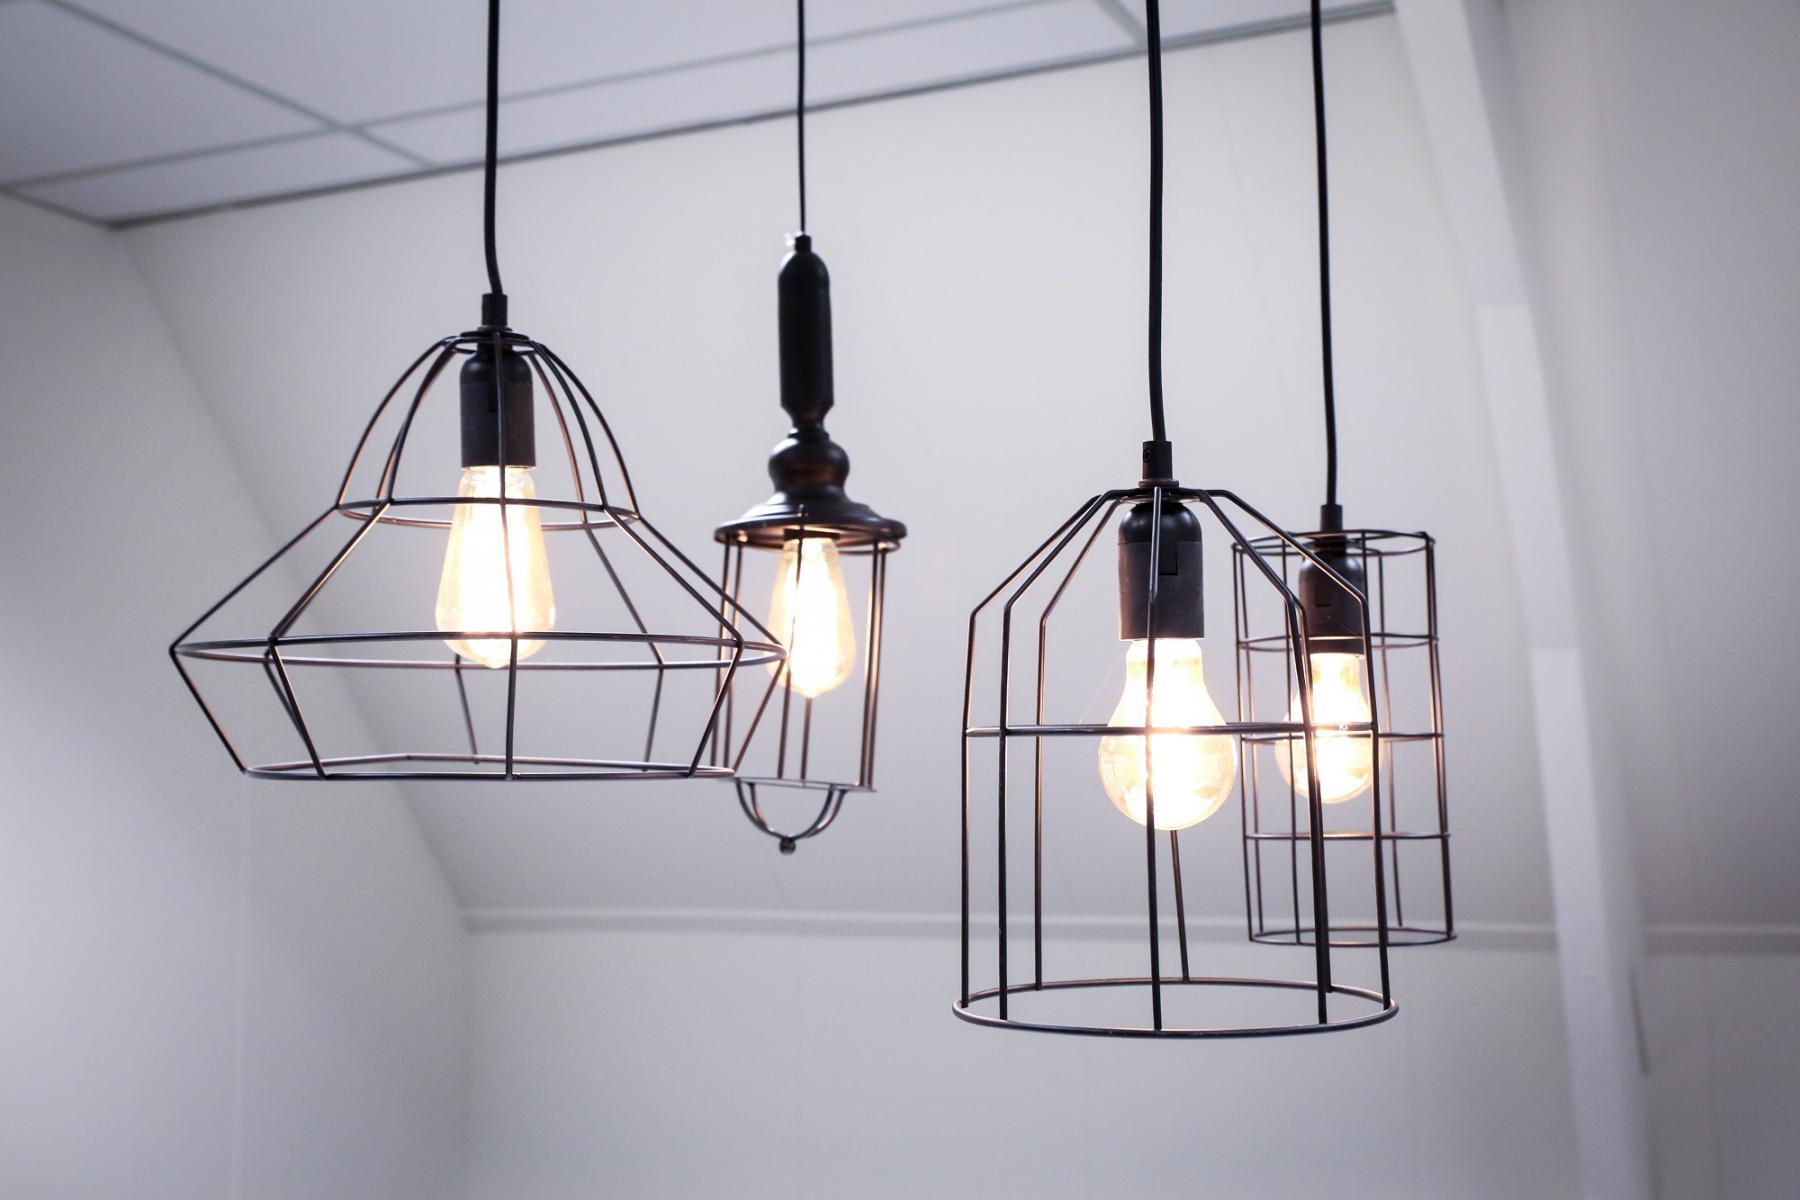 lights geomatric hanging wall white